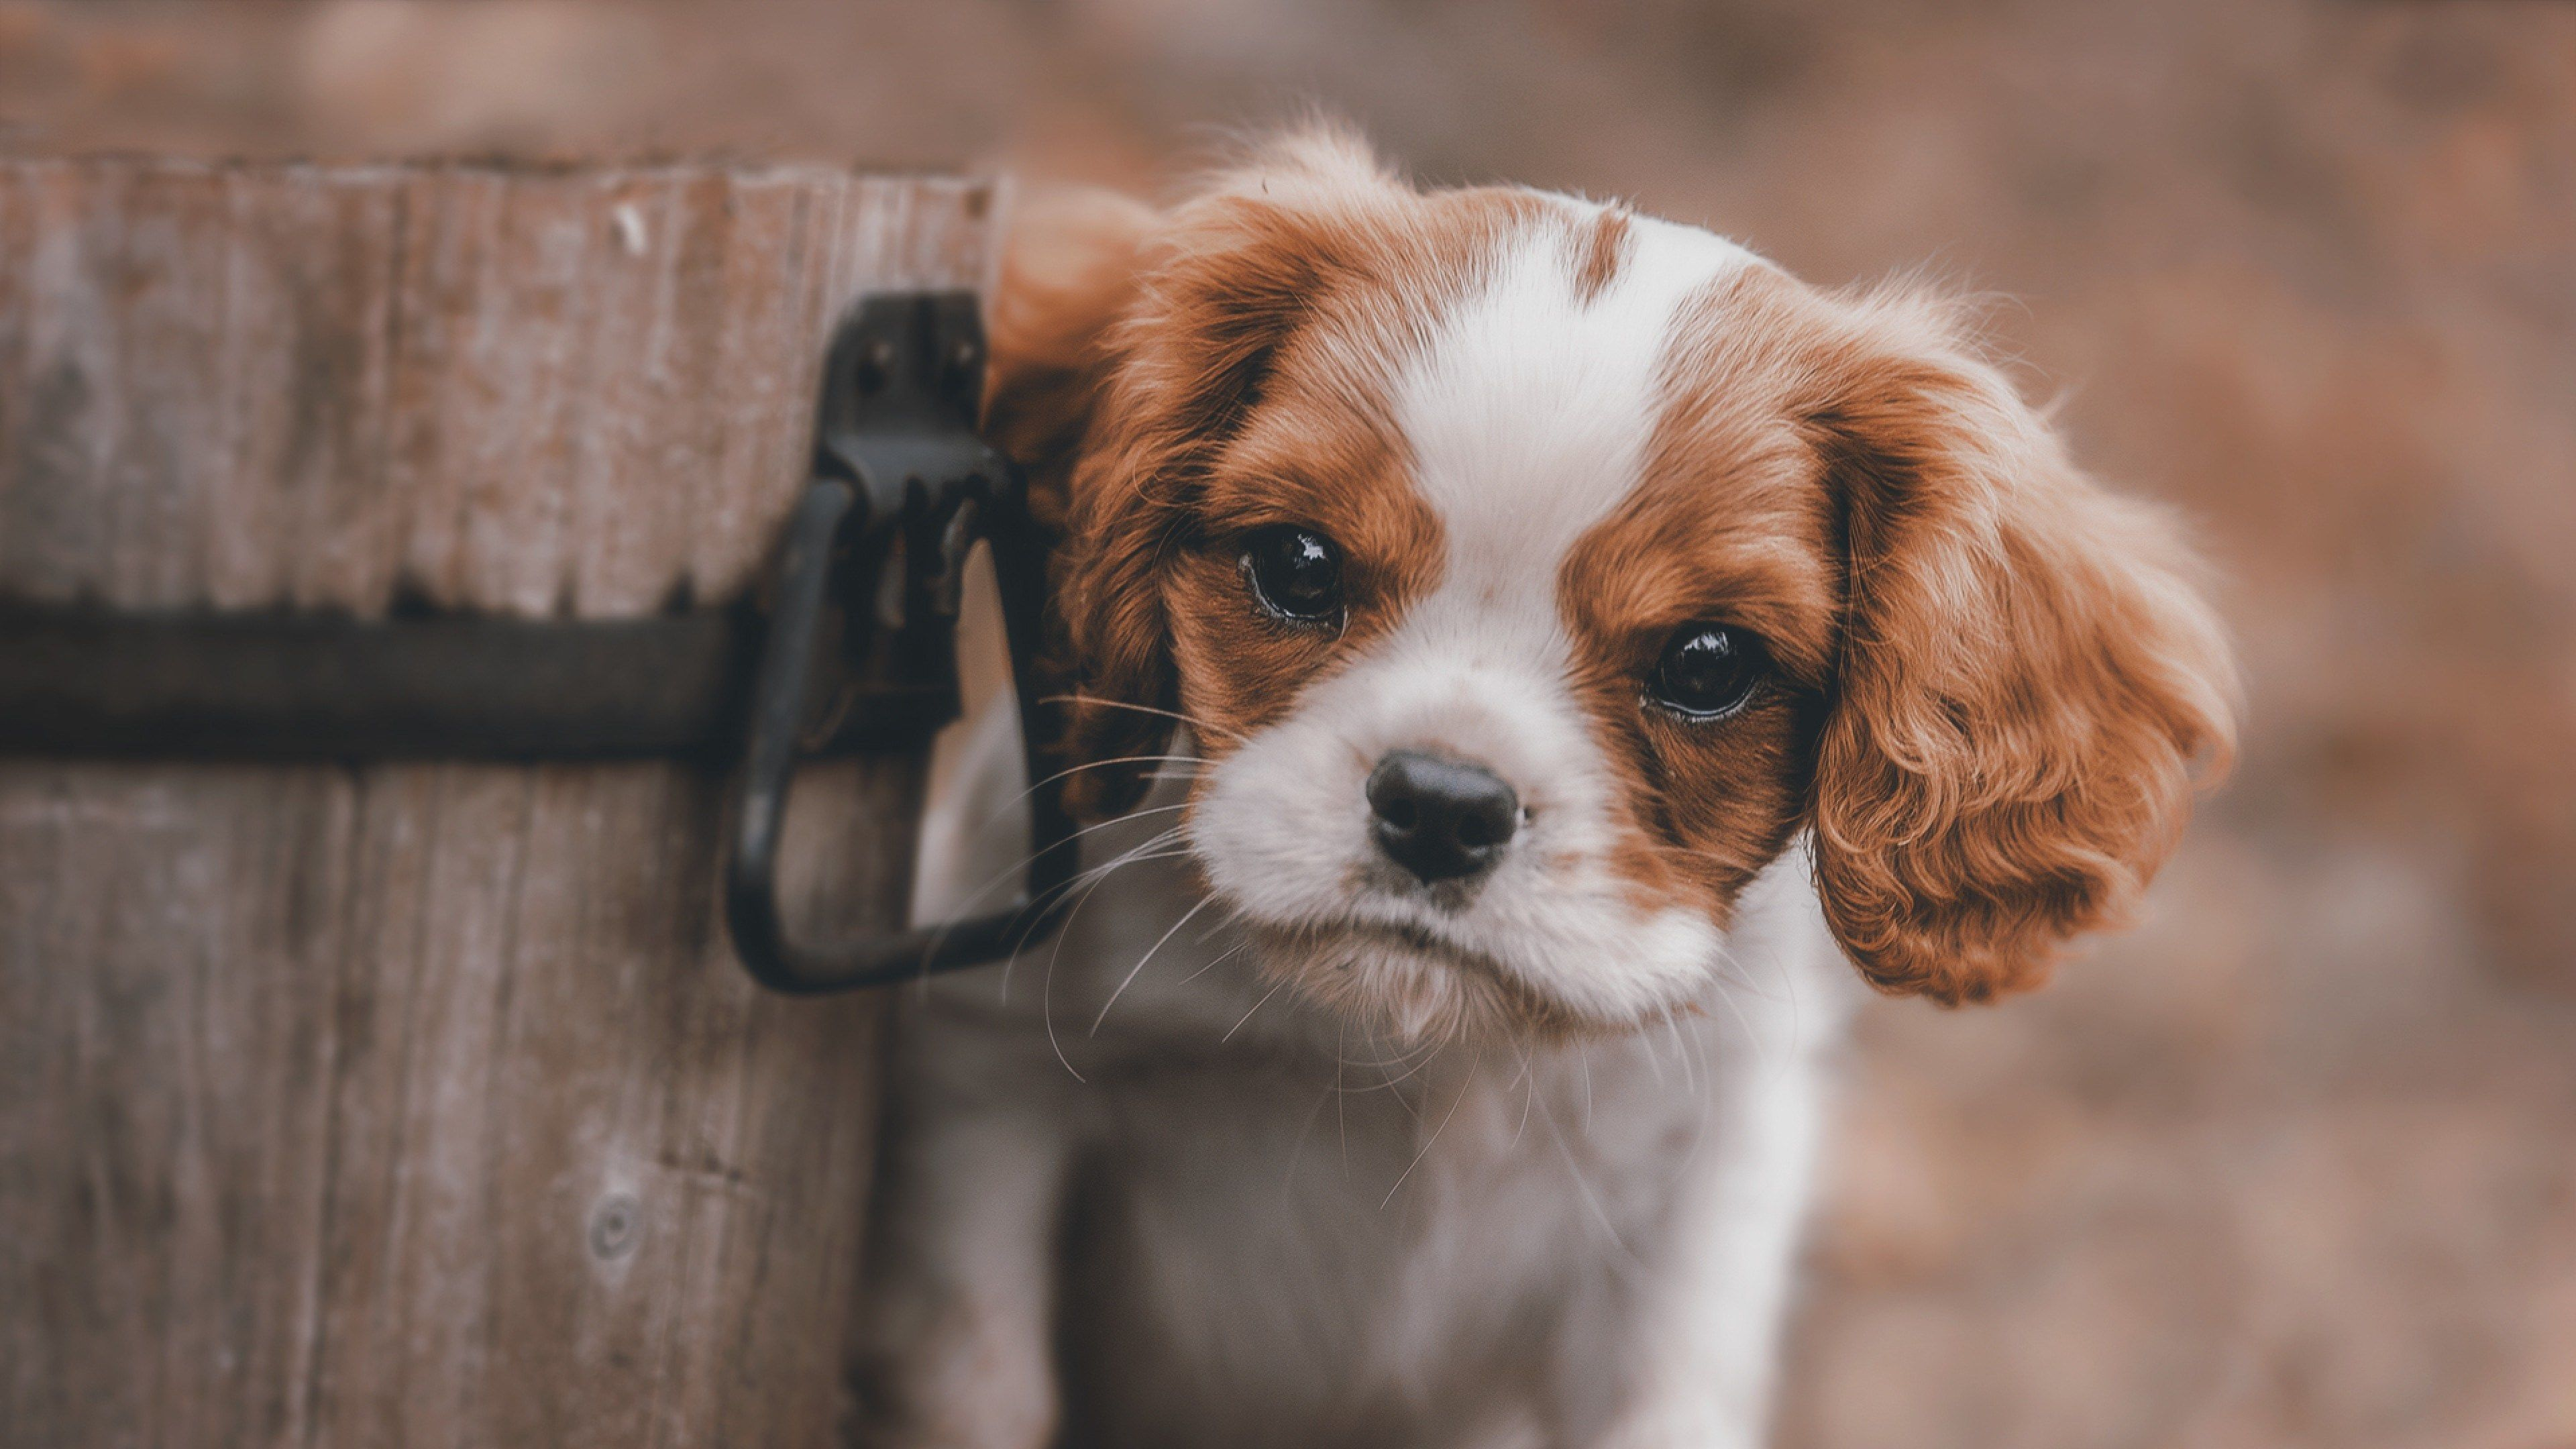 3840x2160 Animals 4k Best Hd Wallpaper Cute Puppies Puppies